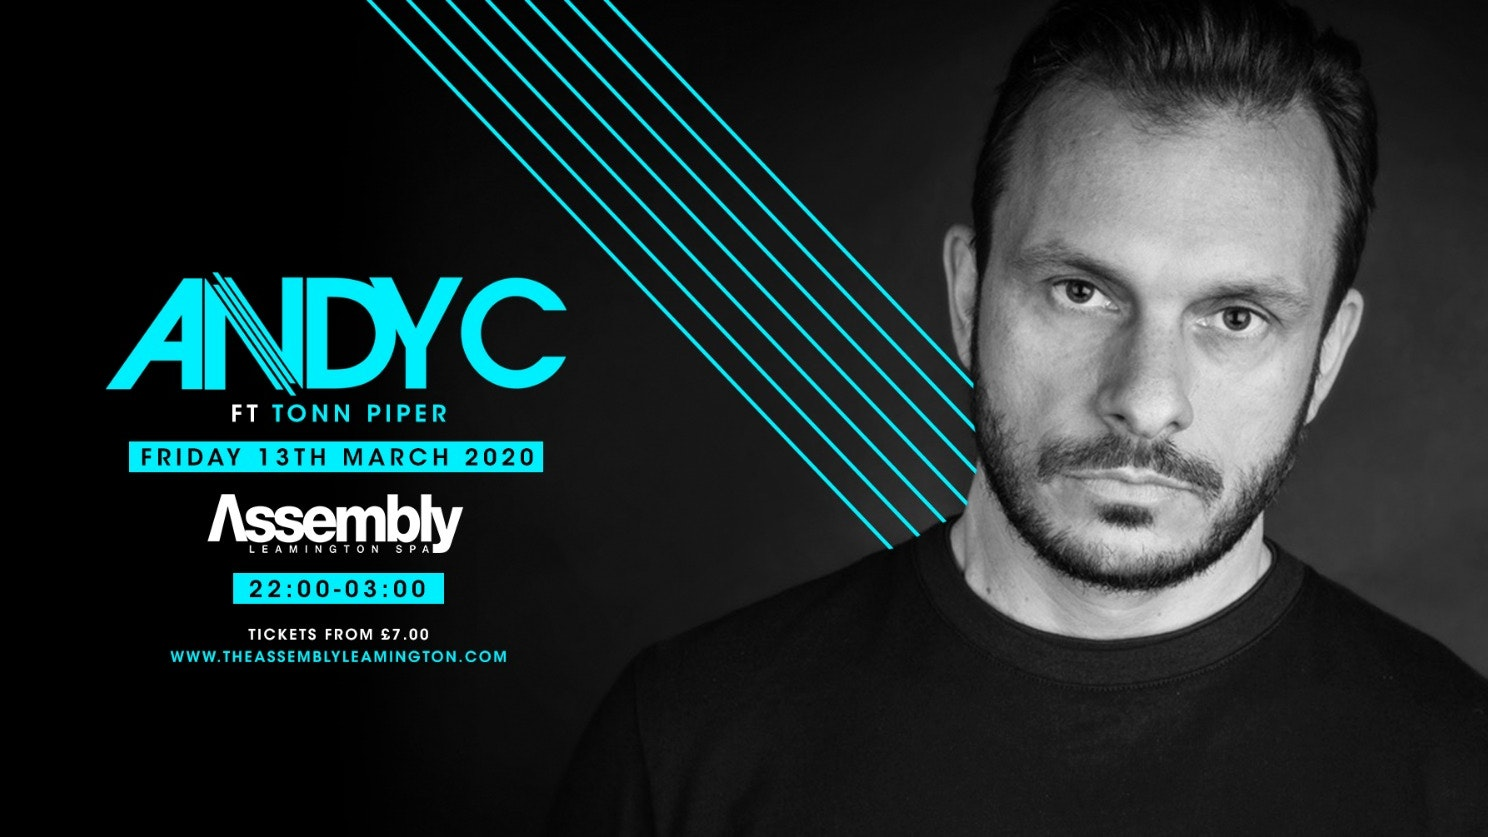 Andy C LIVE DJ Set: Assembly Leamington